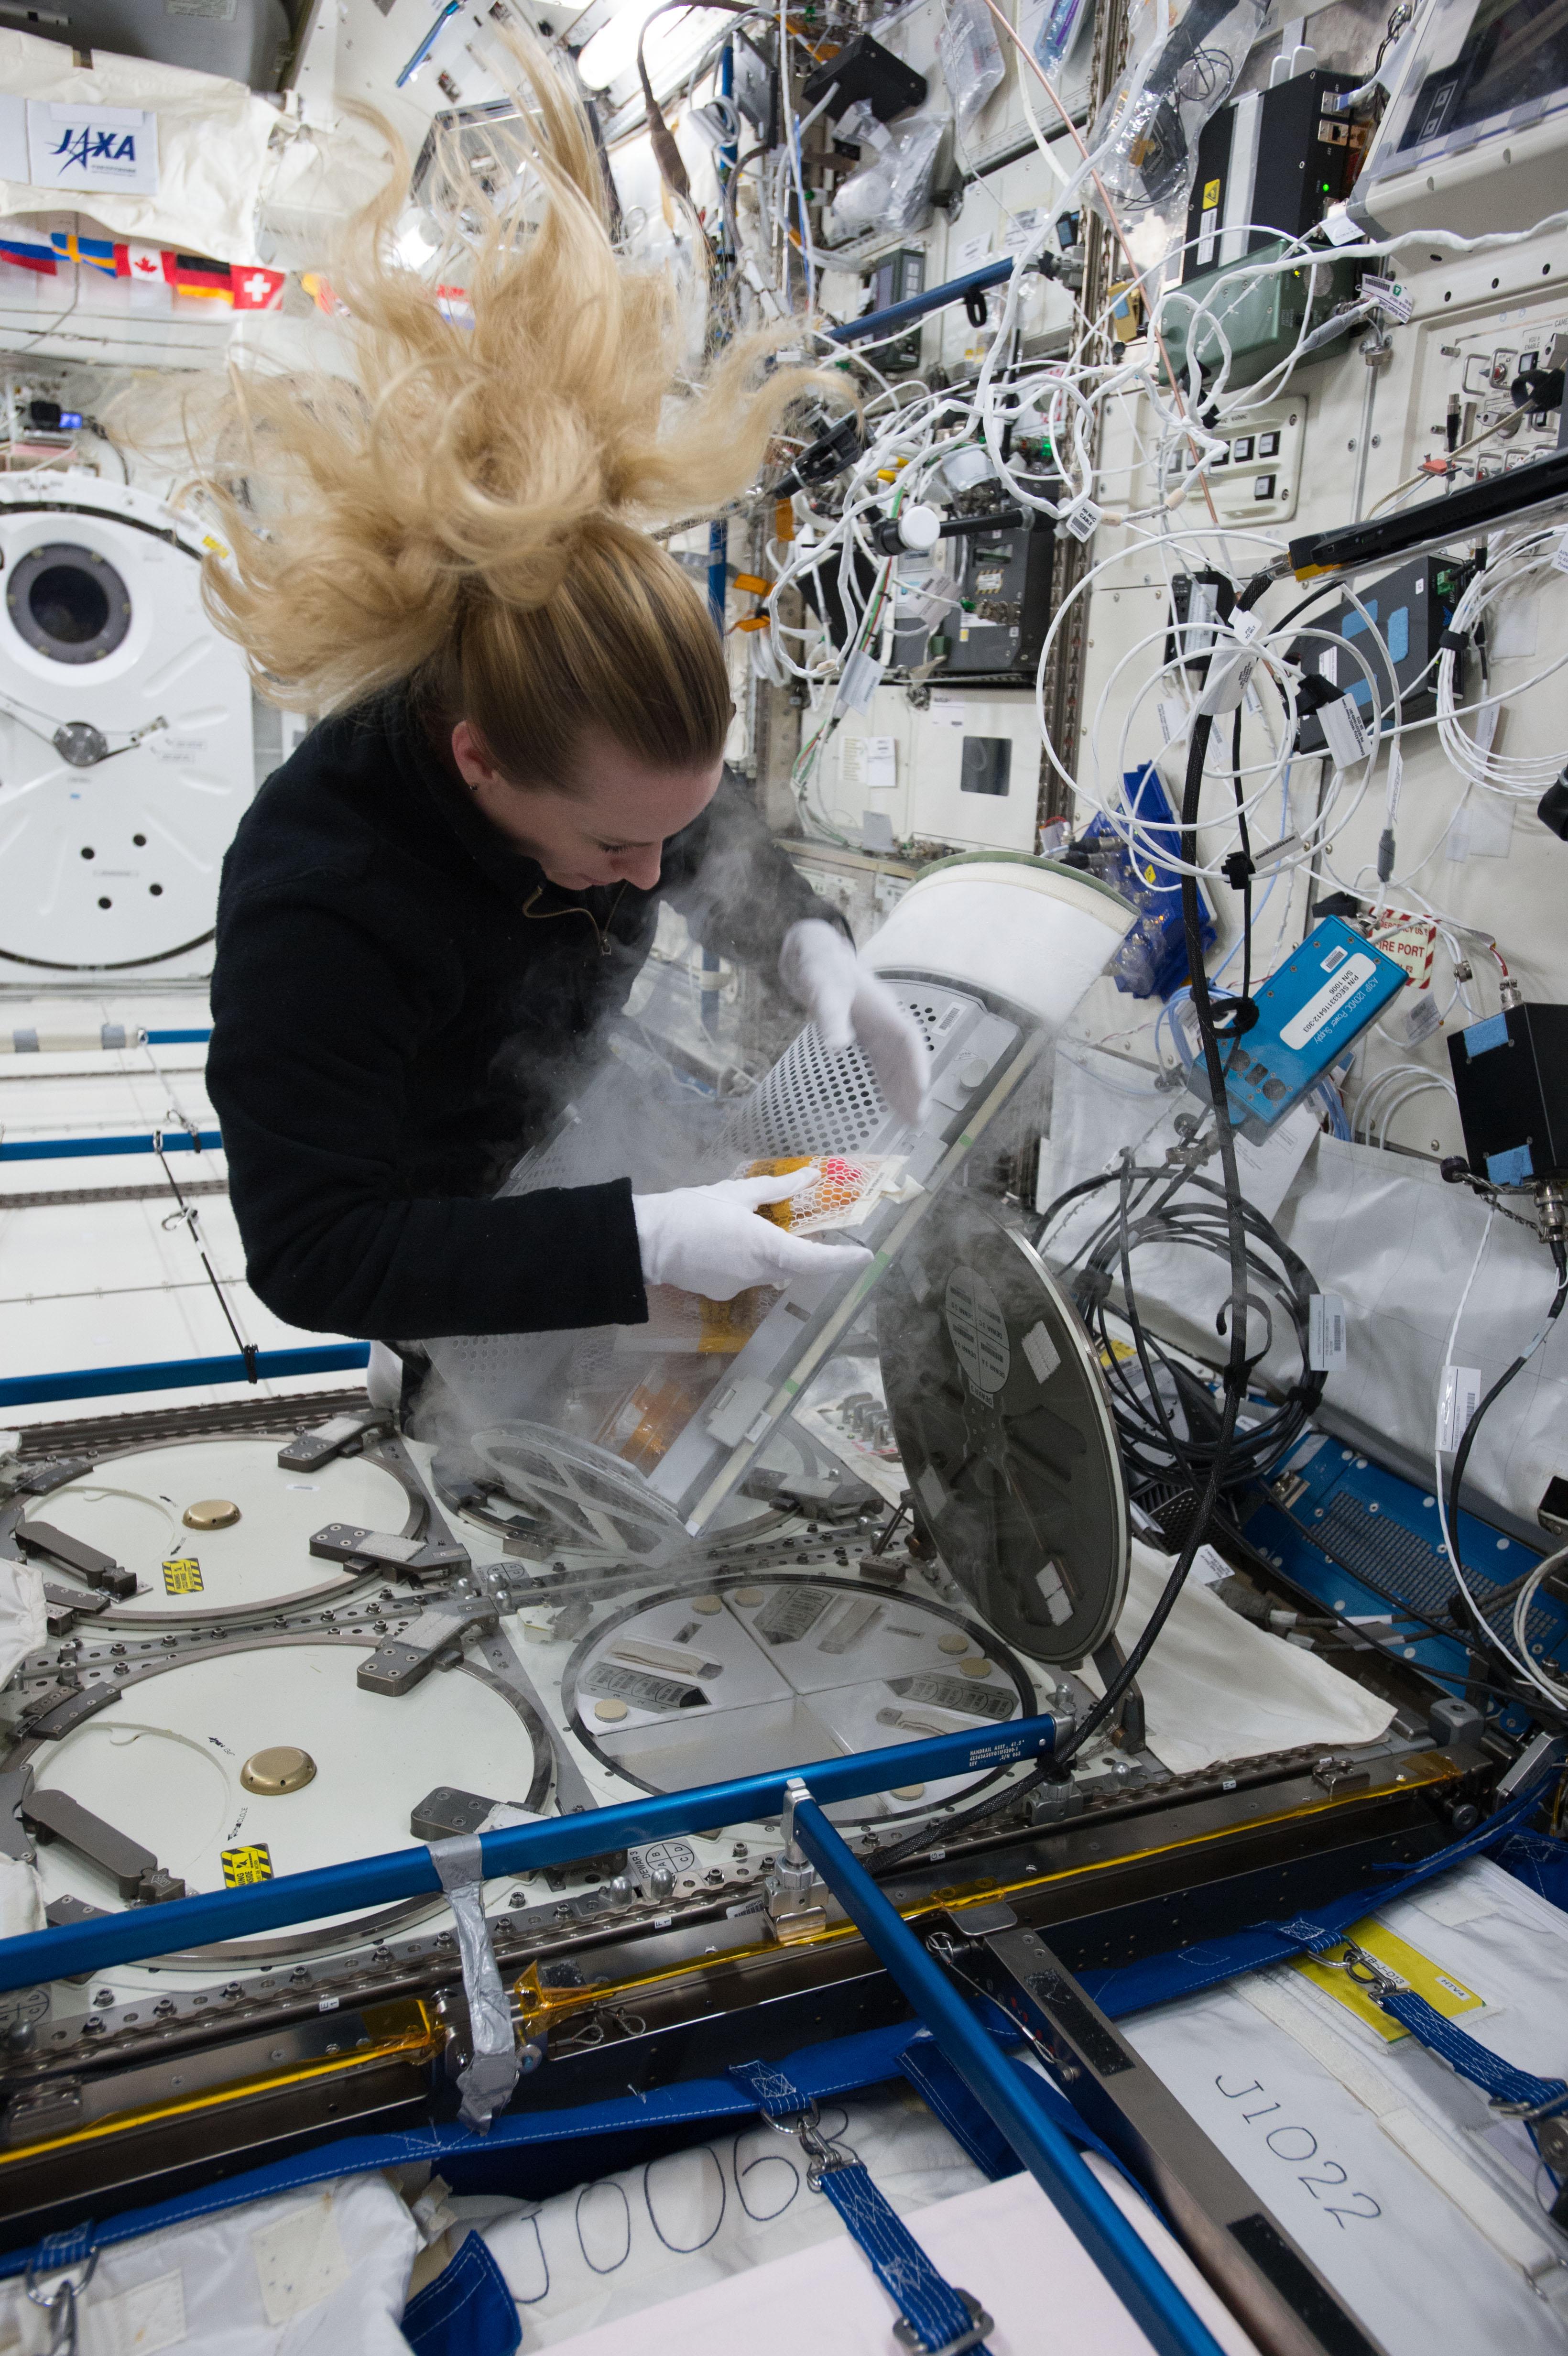 hazards of being an astronaut - photo #35